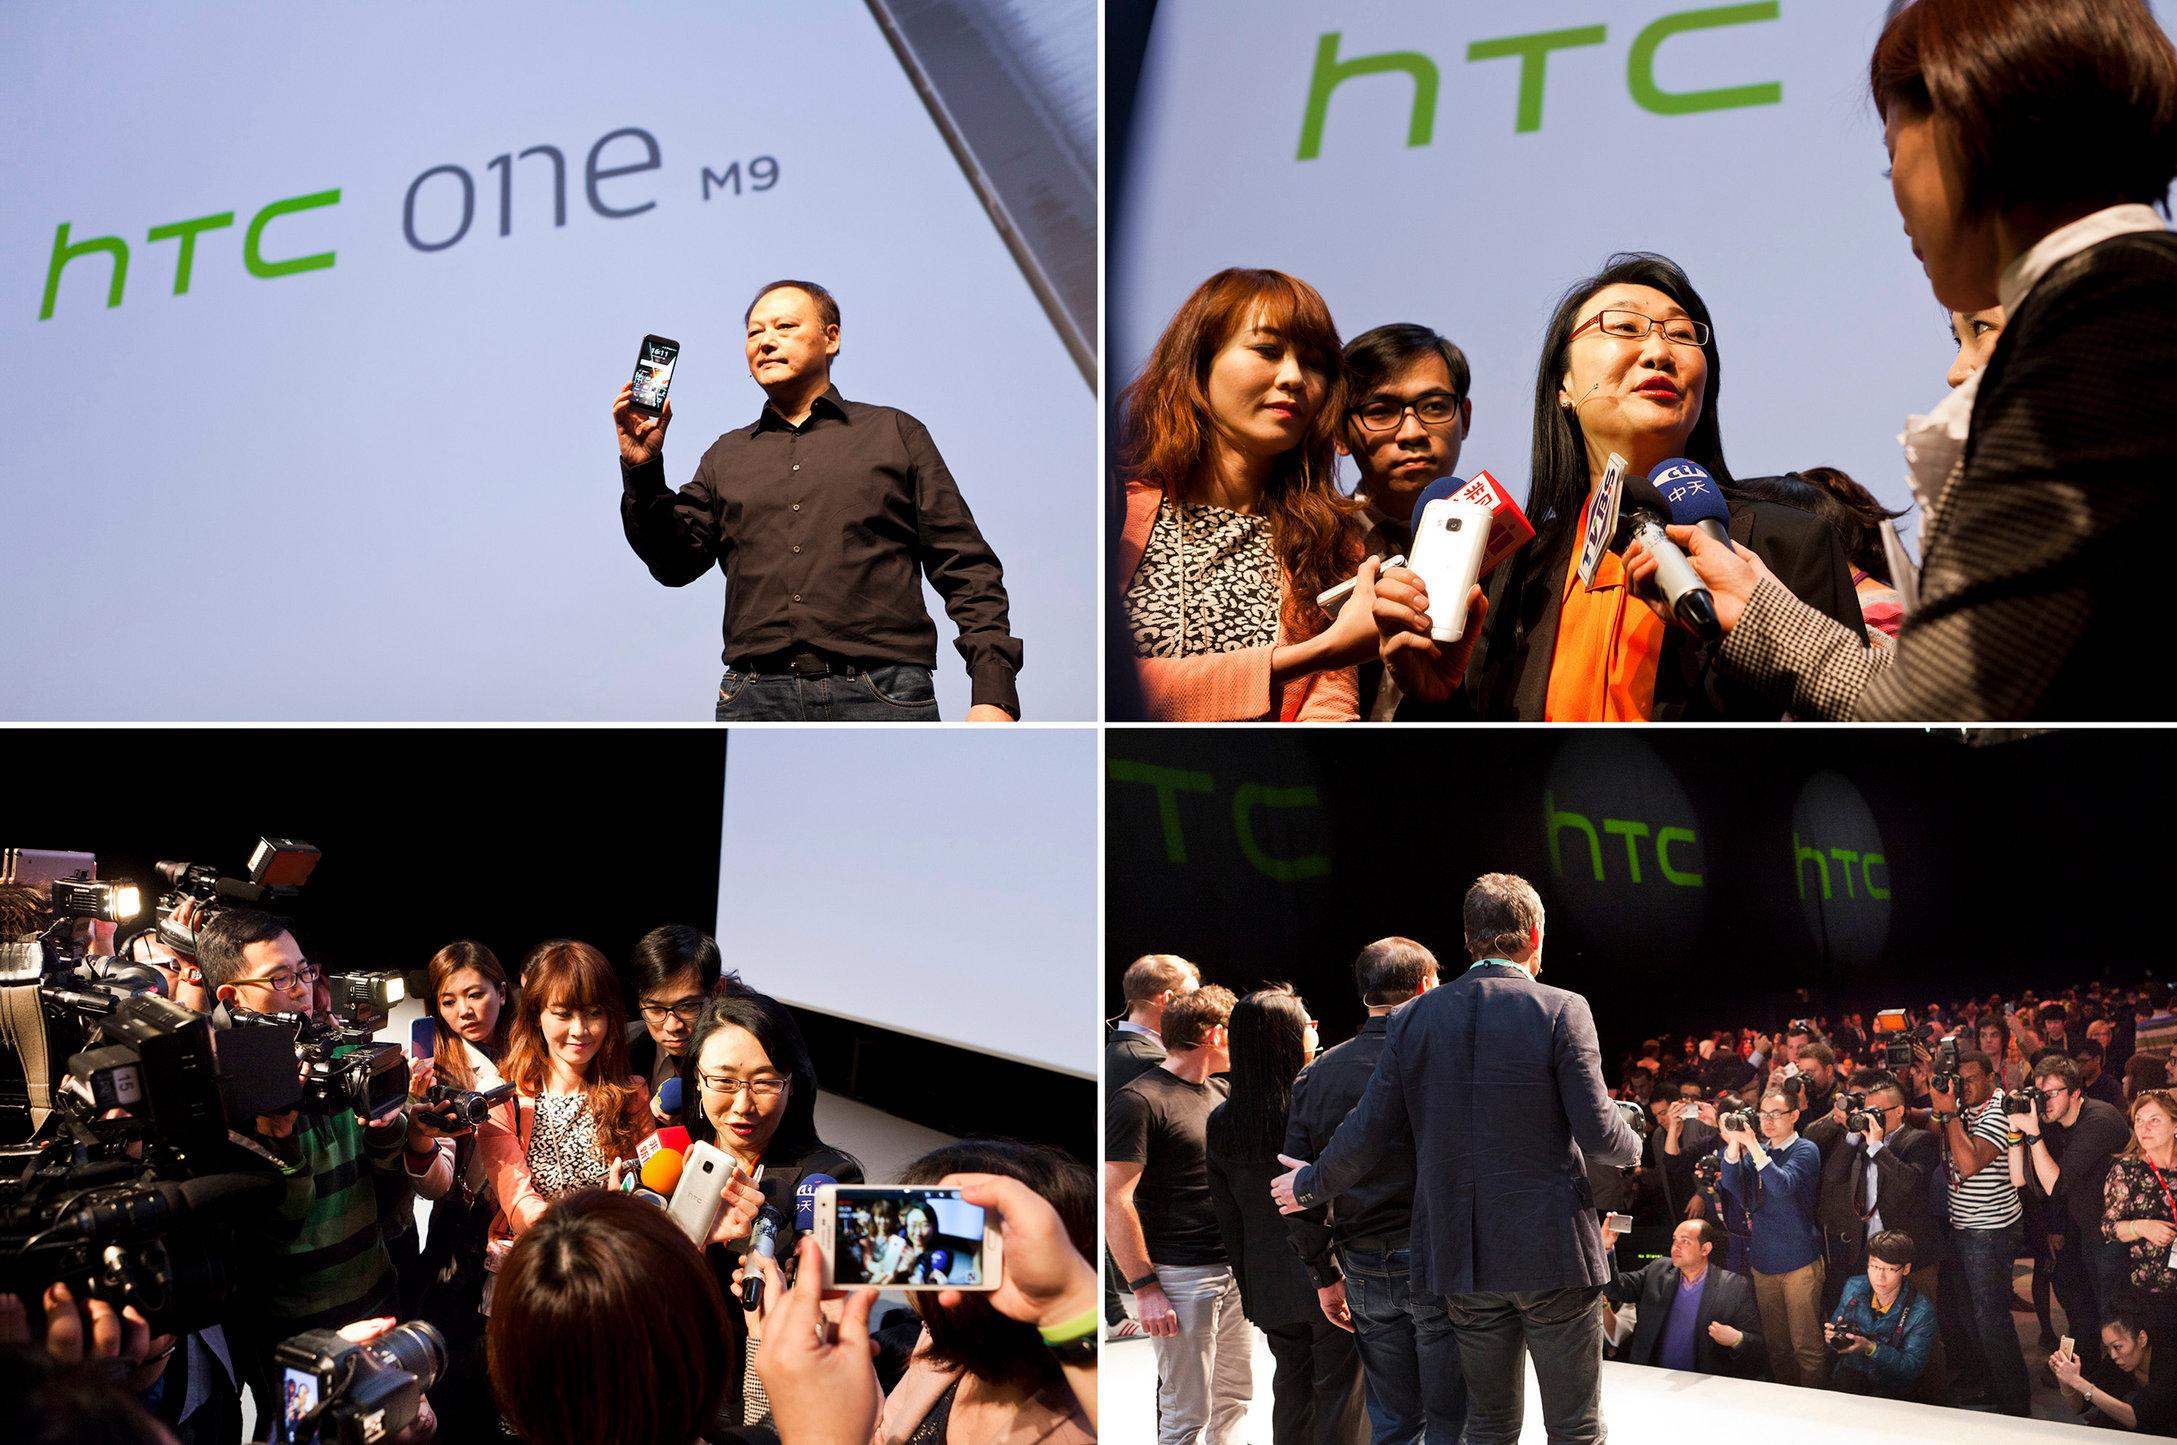 0004_HTC-Barcelona2015-2560-HighRes.jpg